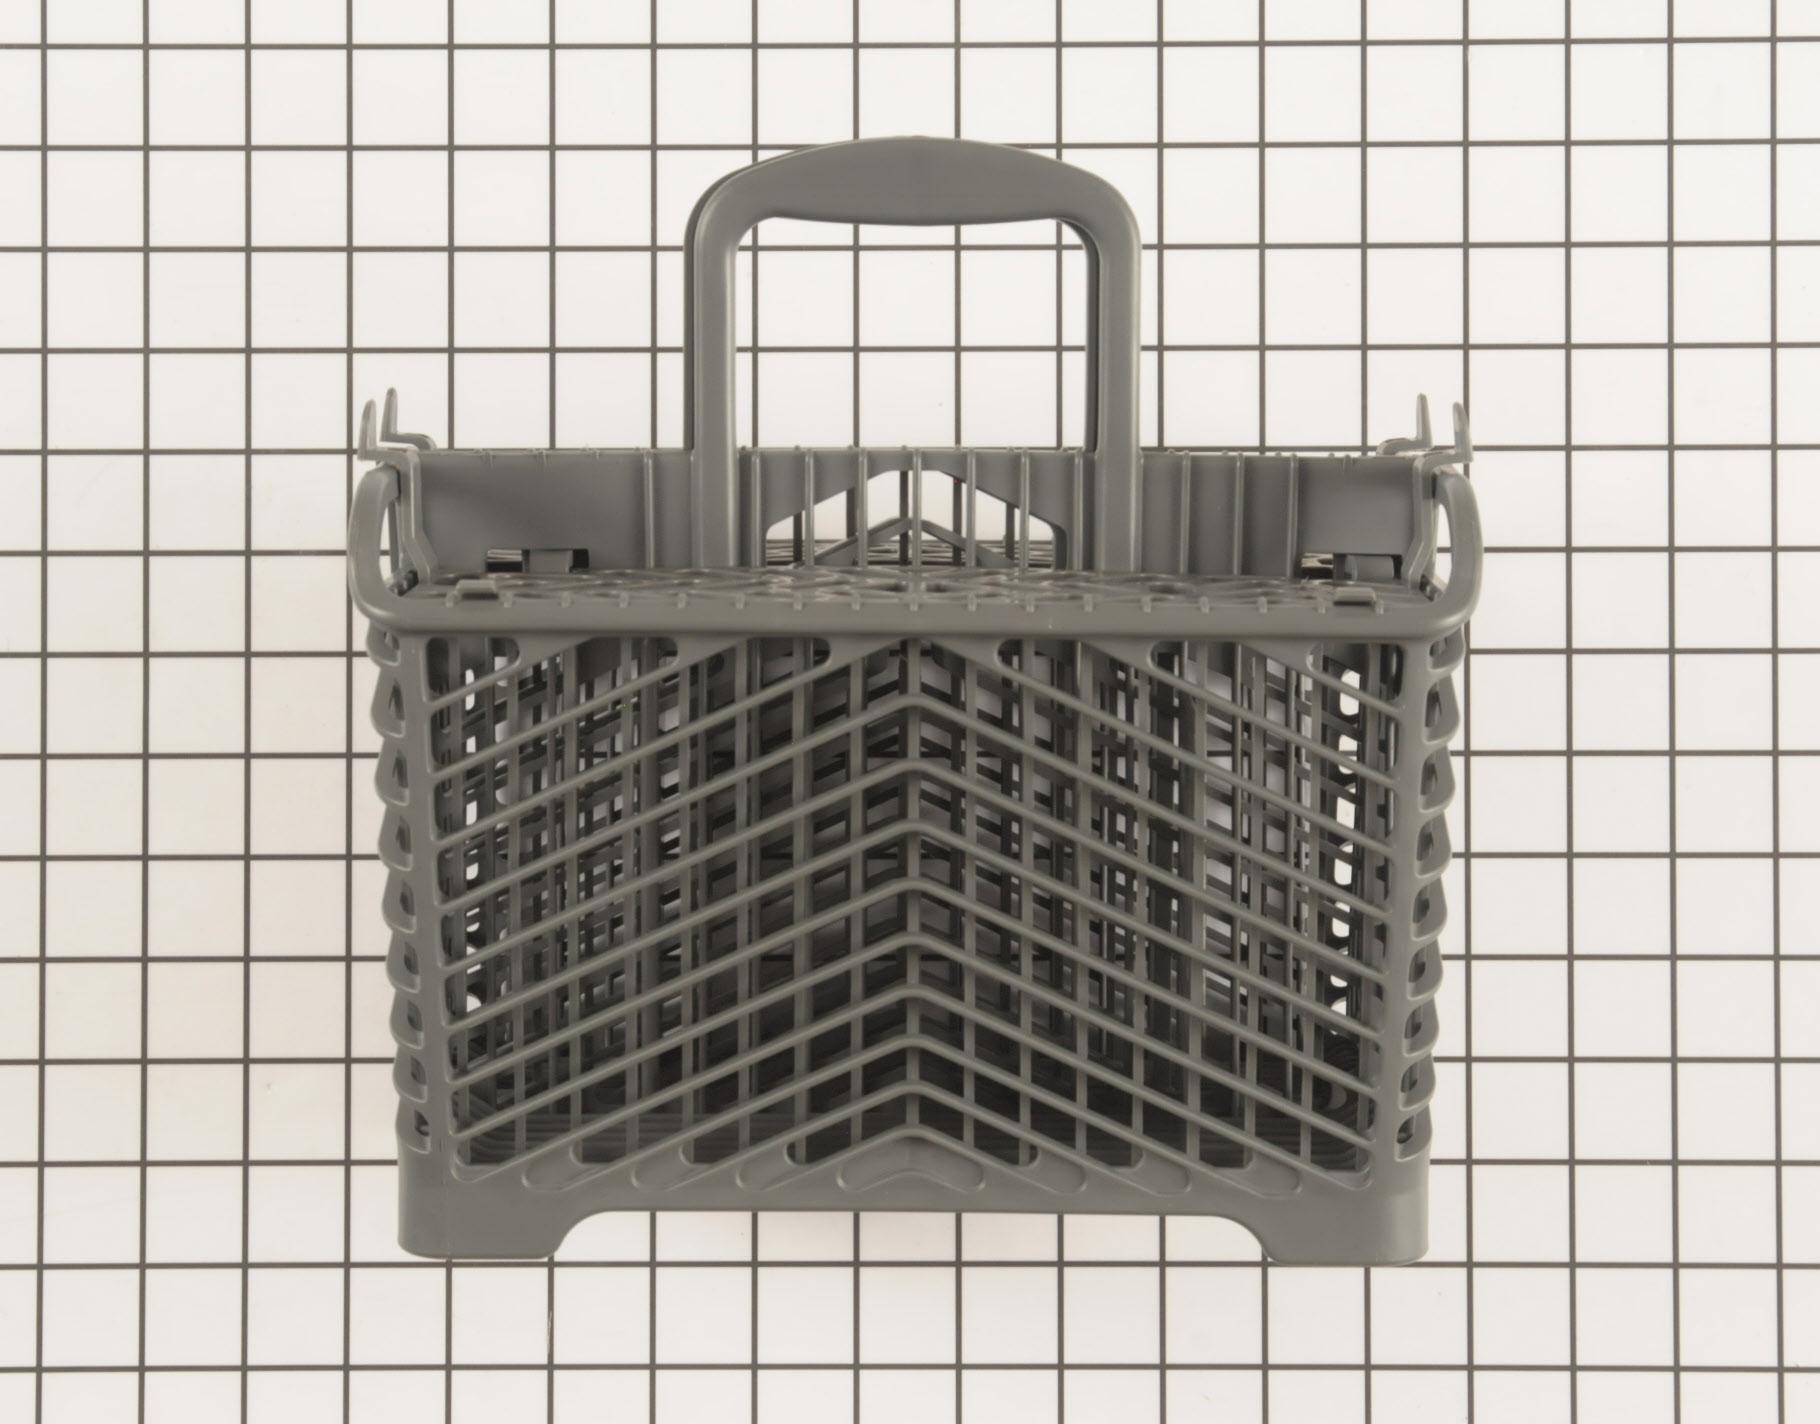 WP6-918873 Crosley Dishwasher Part -Silverware Basket